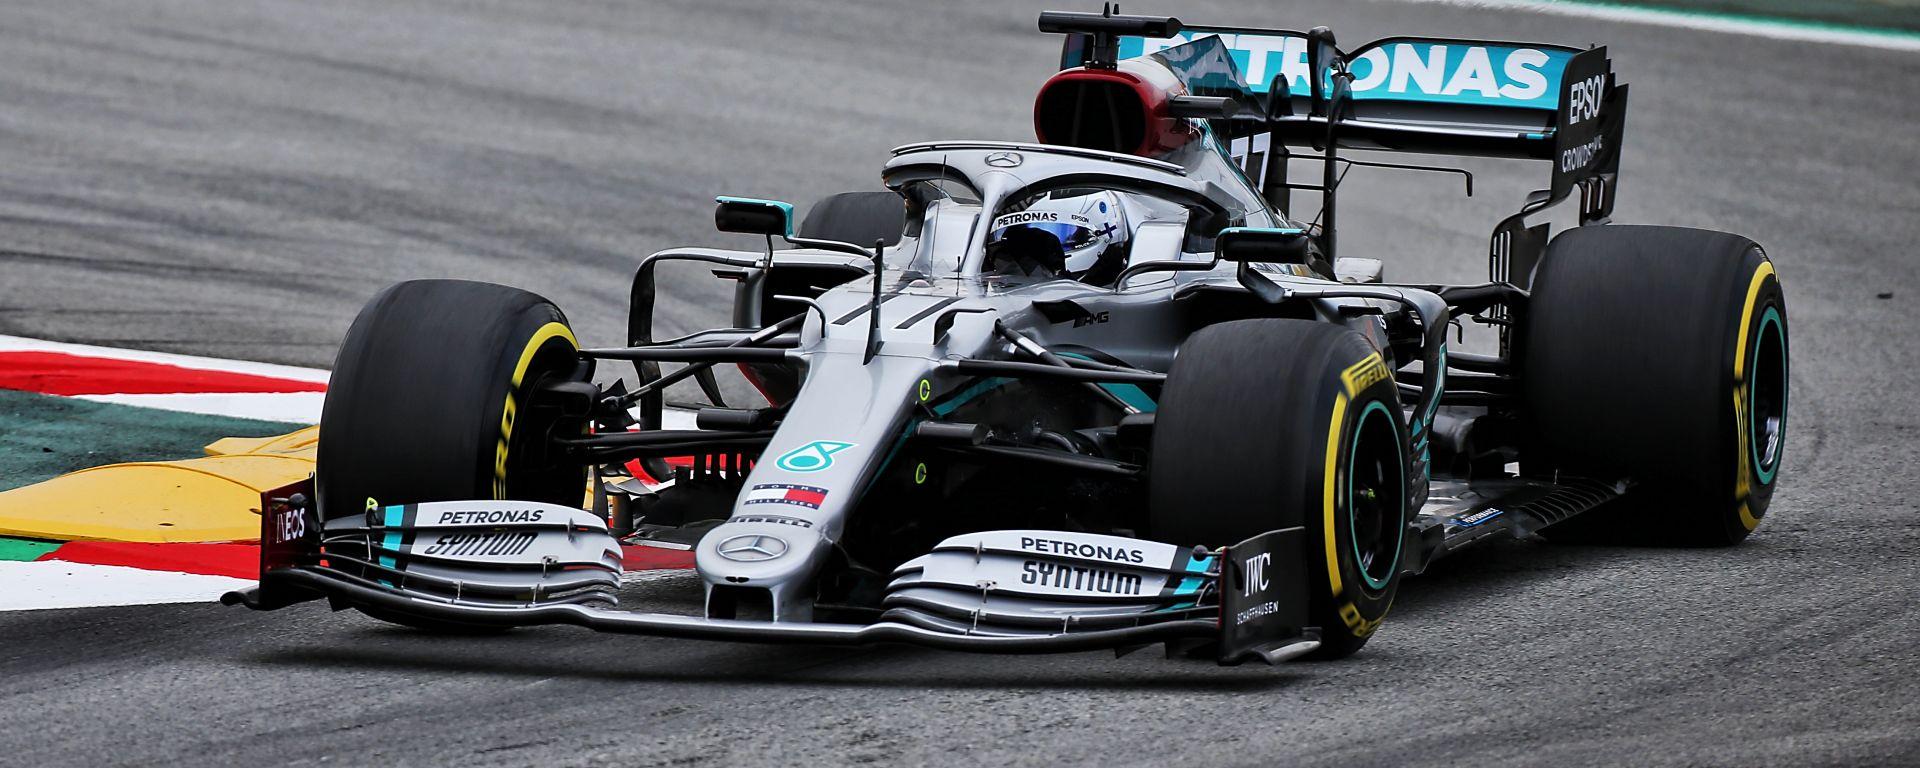 F1 Testing 2020: Valtteri Bottas (Mercedes)